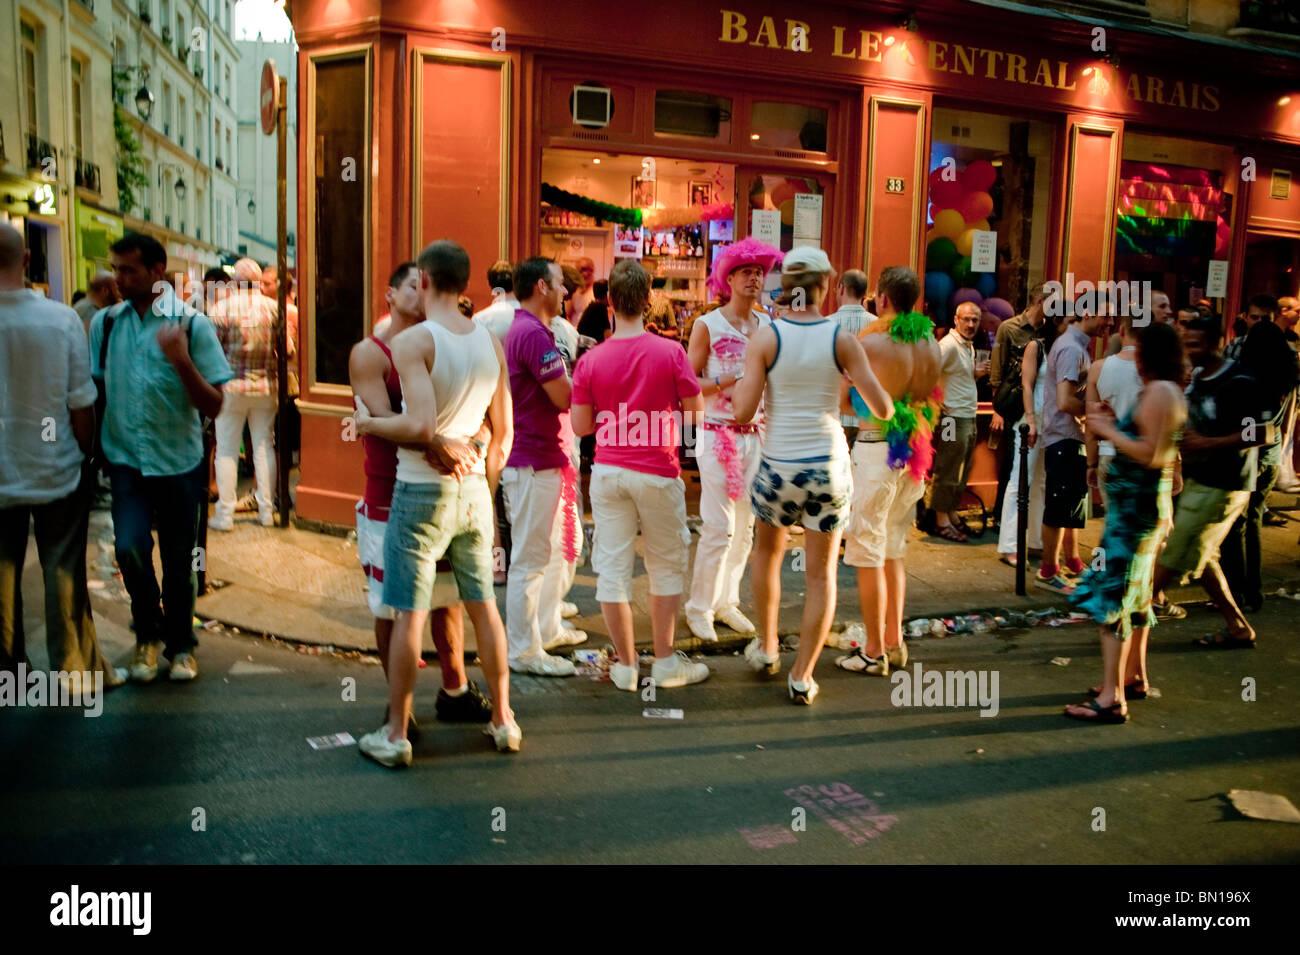 chat rencontre gay bars a Fort de France